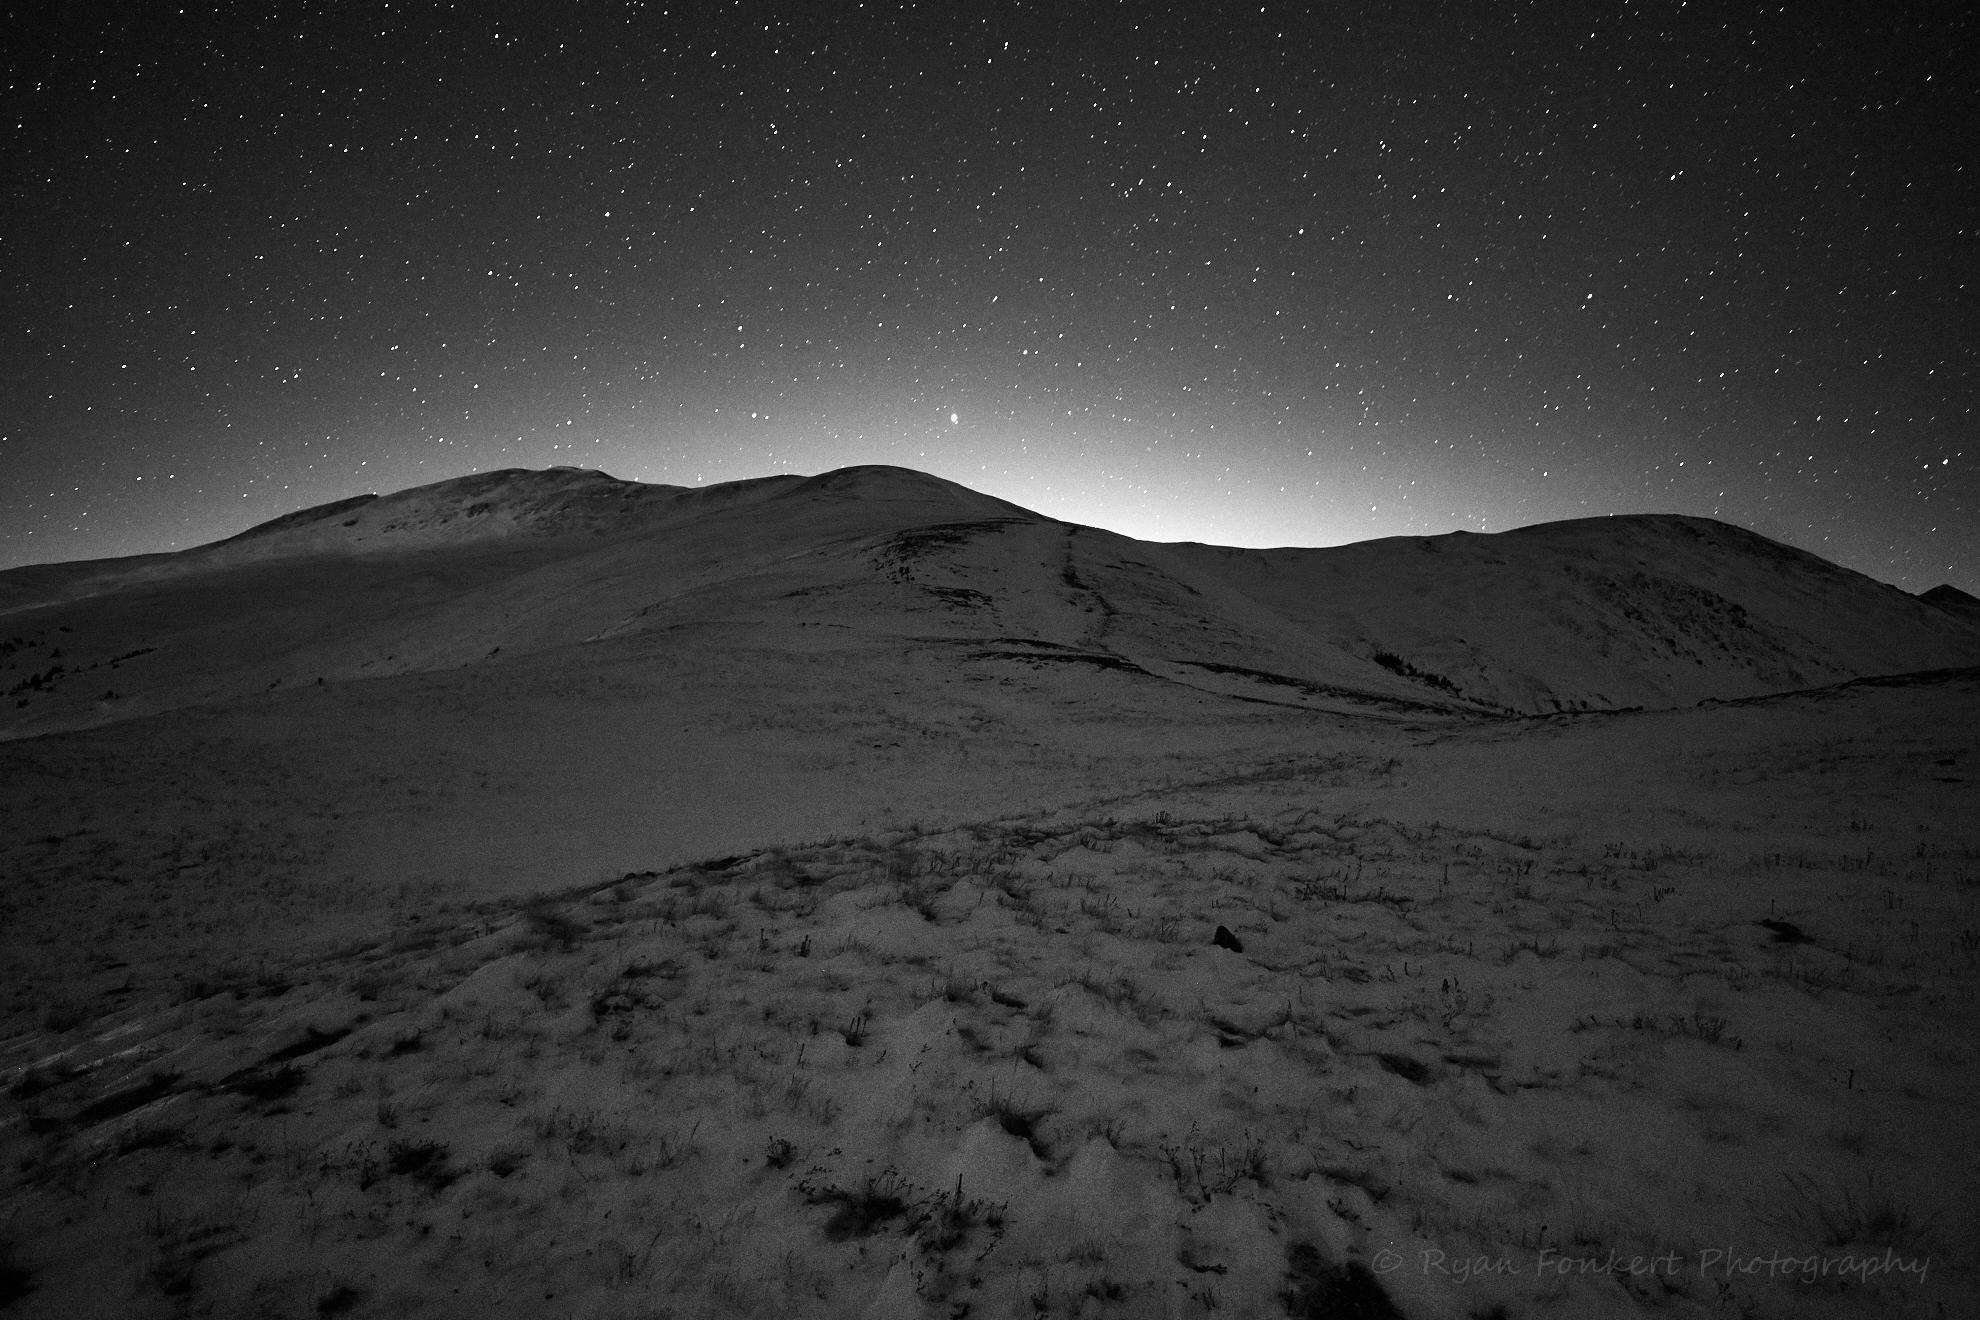 Nightscapes_DSC00254-bw.jpg